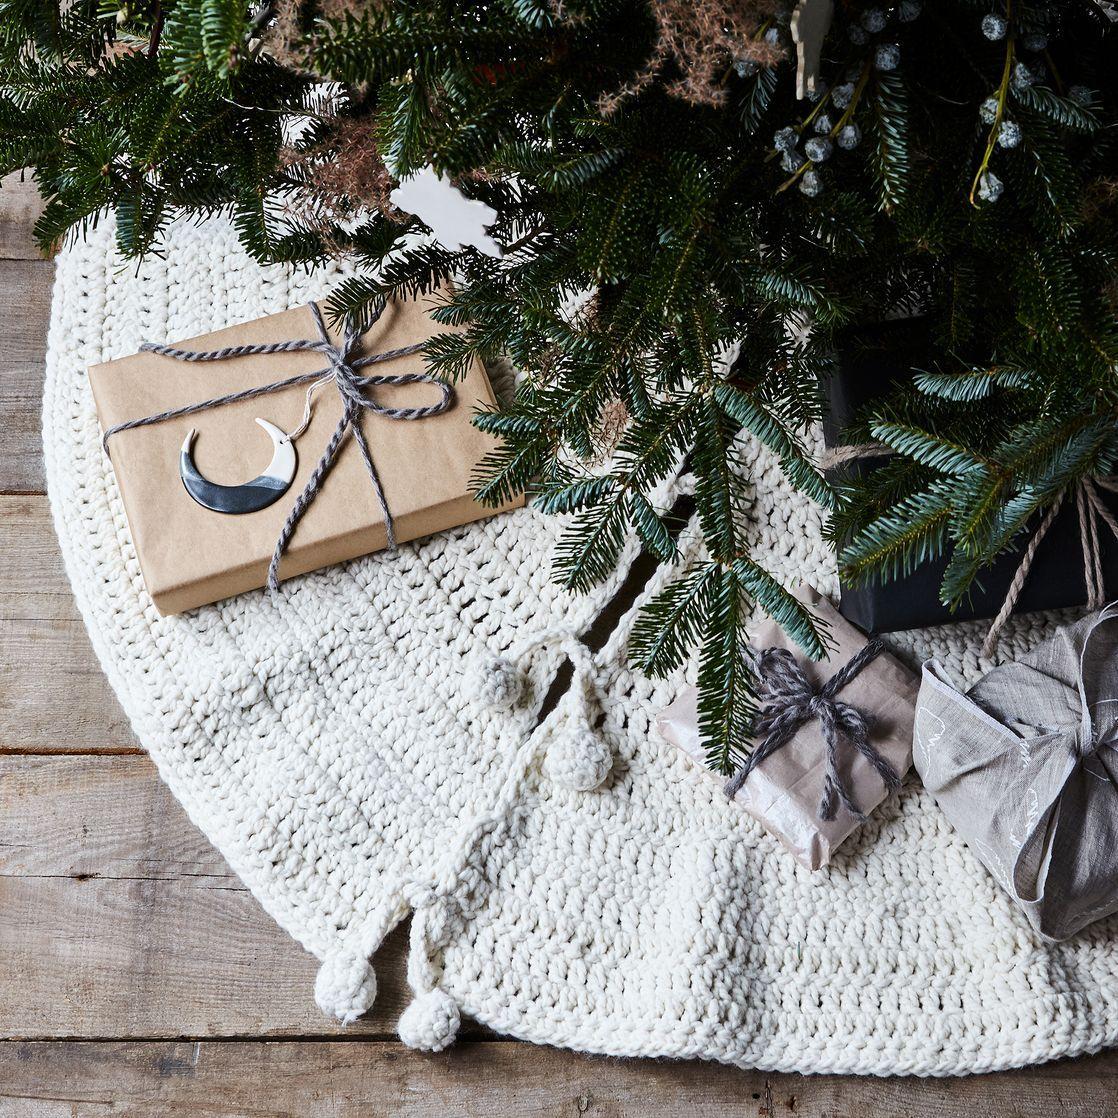 Hand-Crocheted Tree Skirt | Crochet tree skirt, Crochet tree and ...